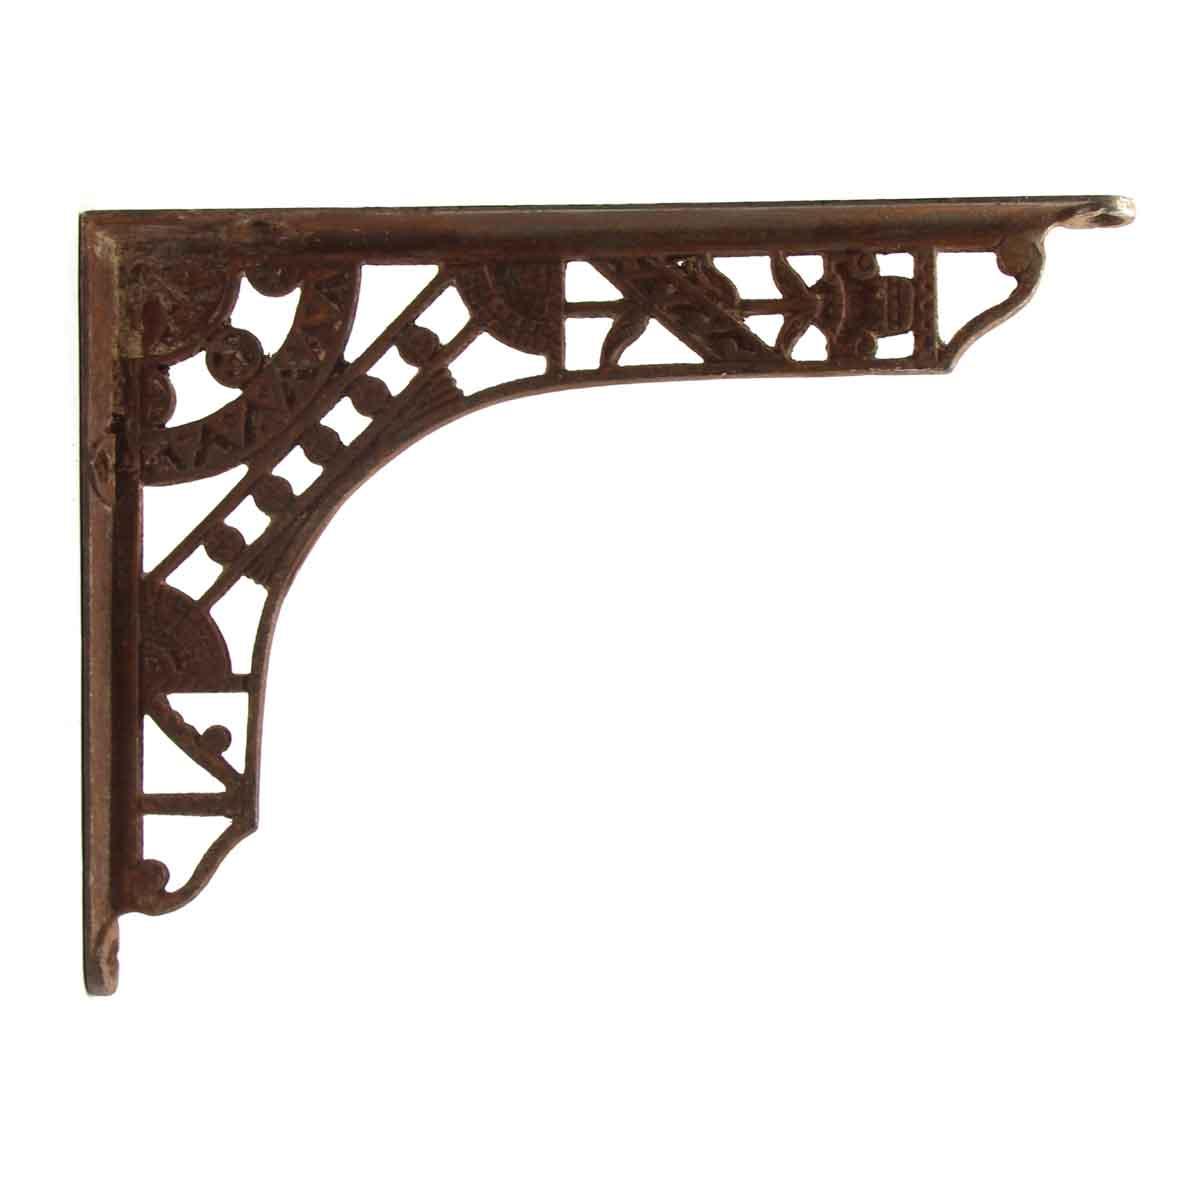 Ornate Shelf Bracket Made Of Cast Iron